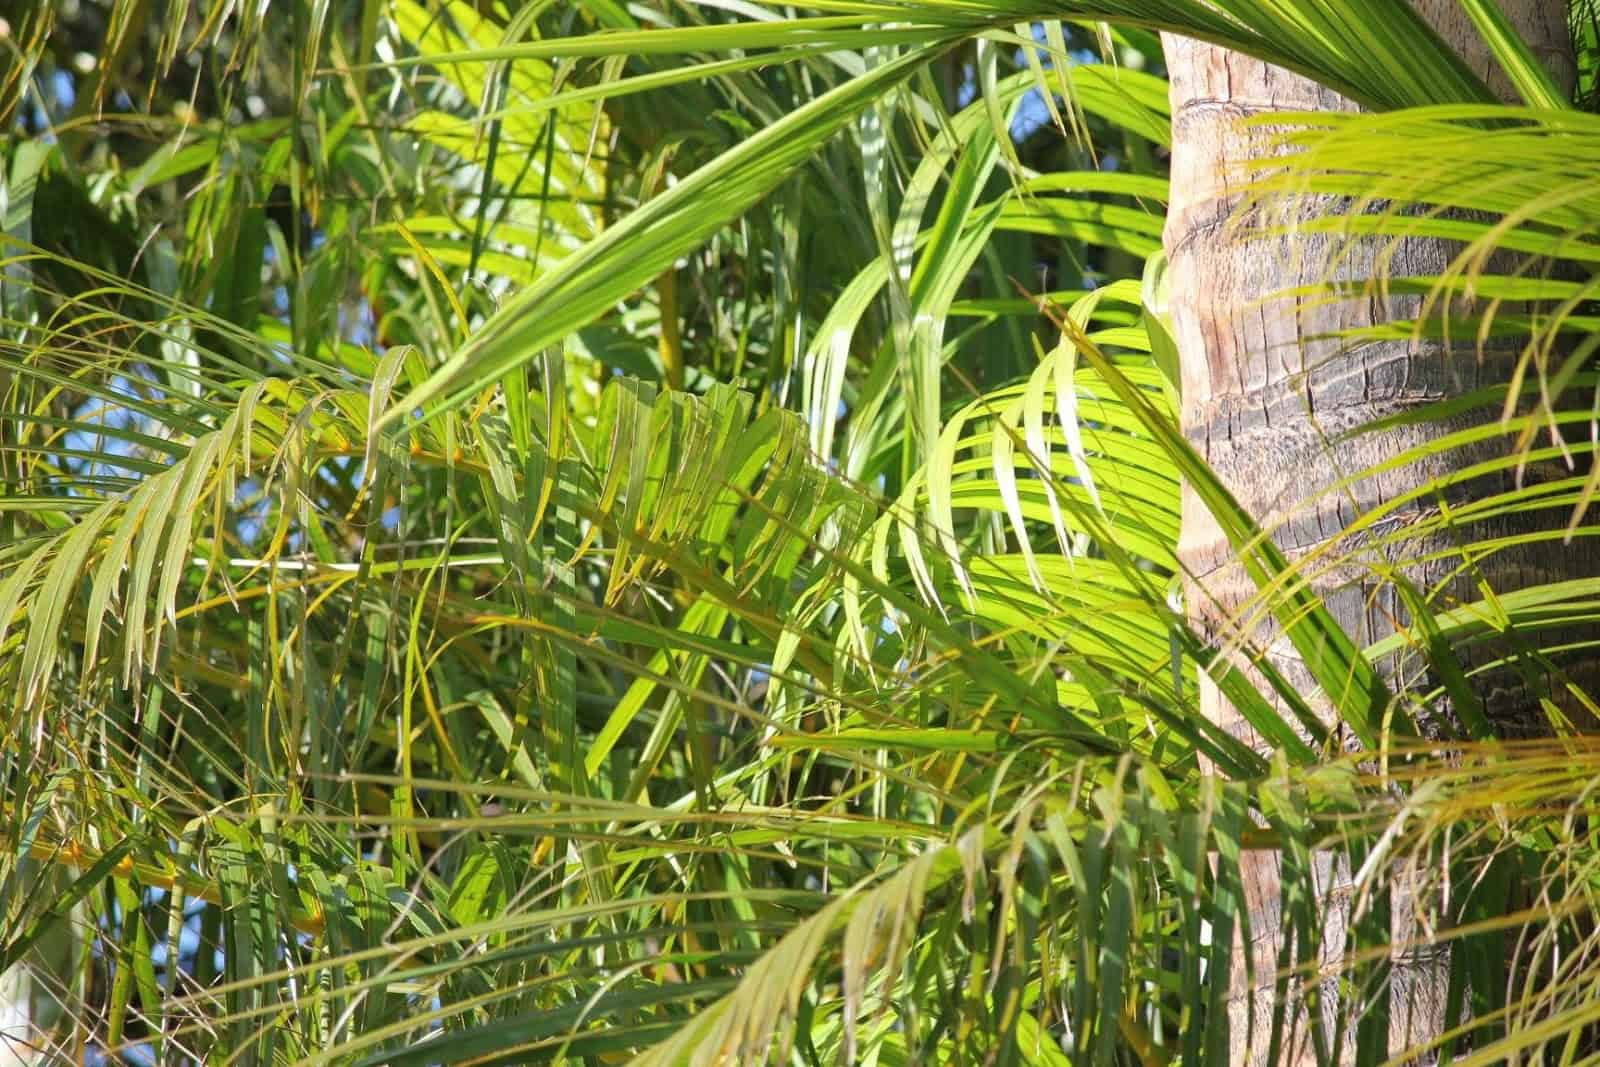 areca palms